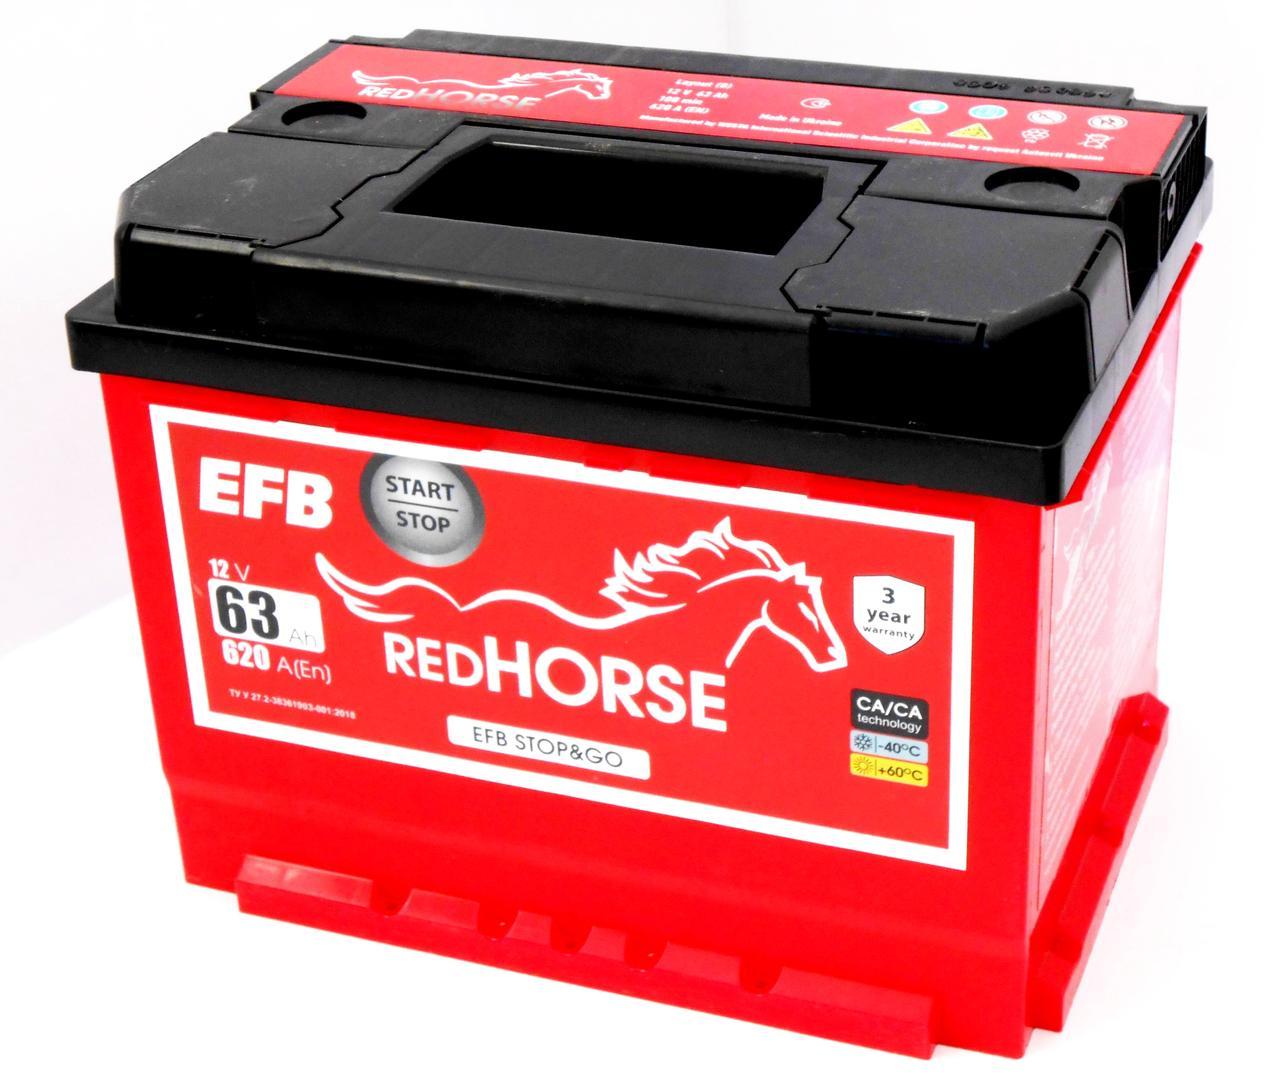 Аккумулятор автомобильный RED HORSE EFB  6СТ 63 Ач (L+) 620 А 2 года гарантии